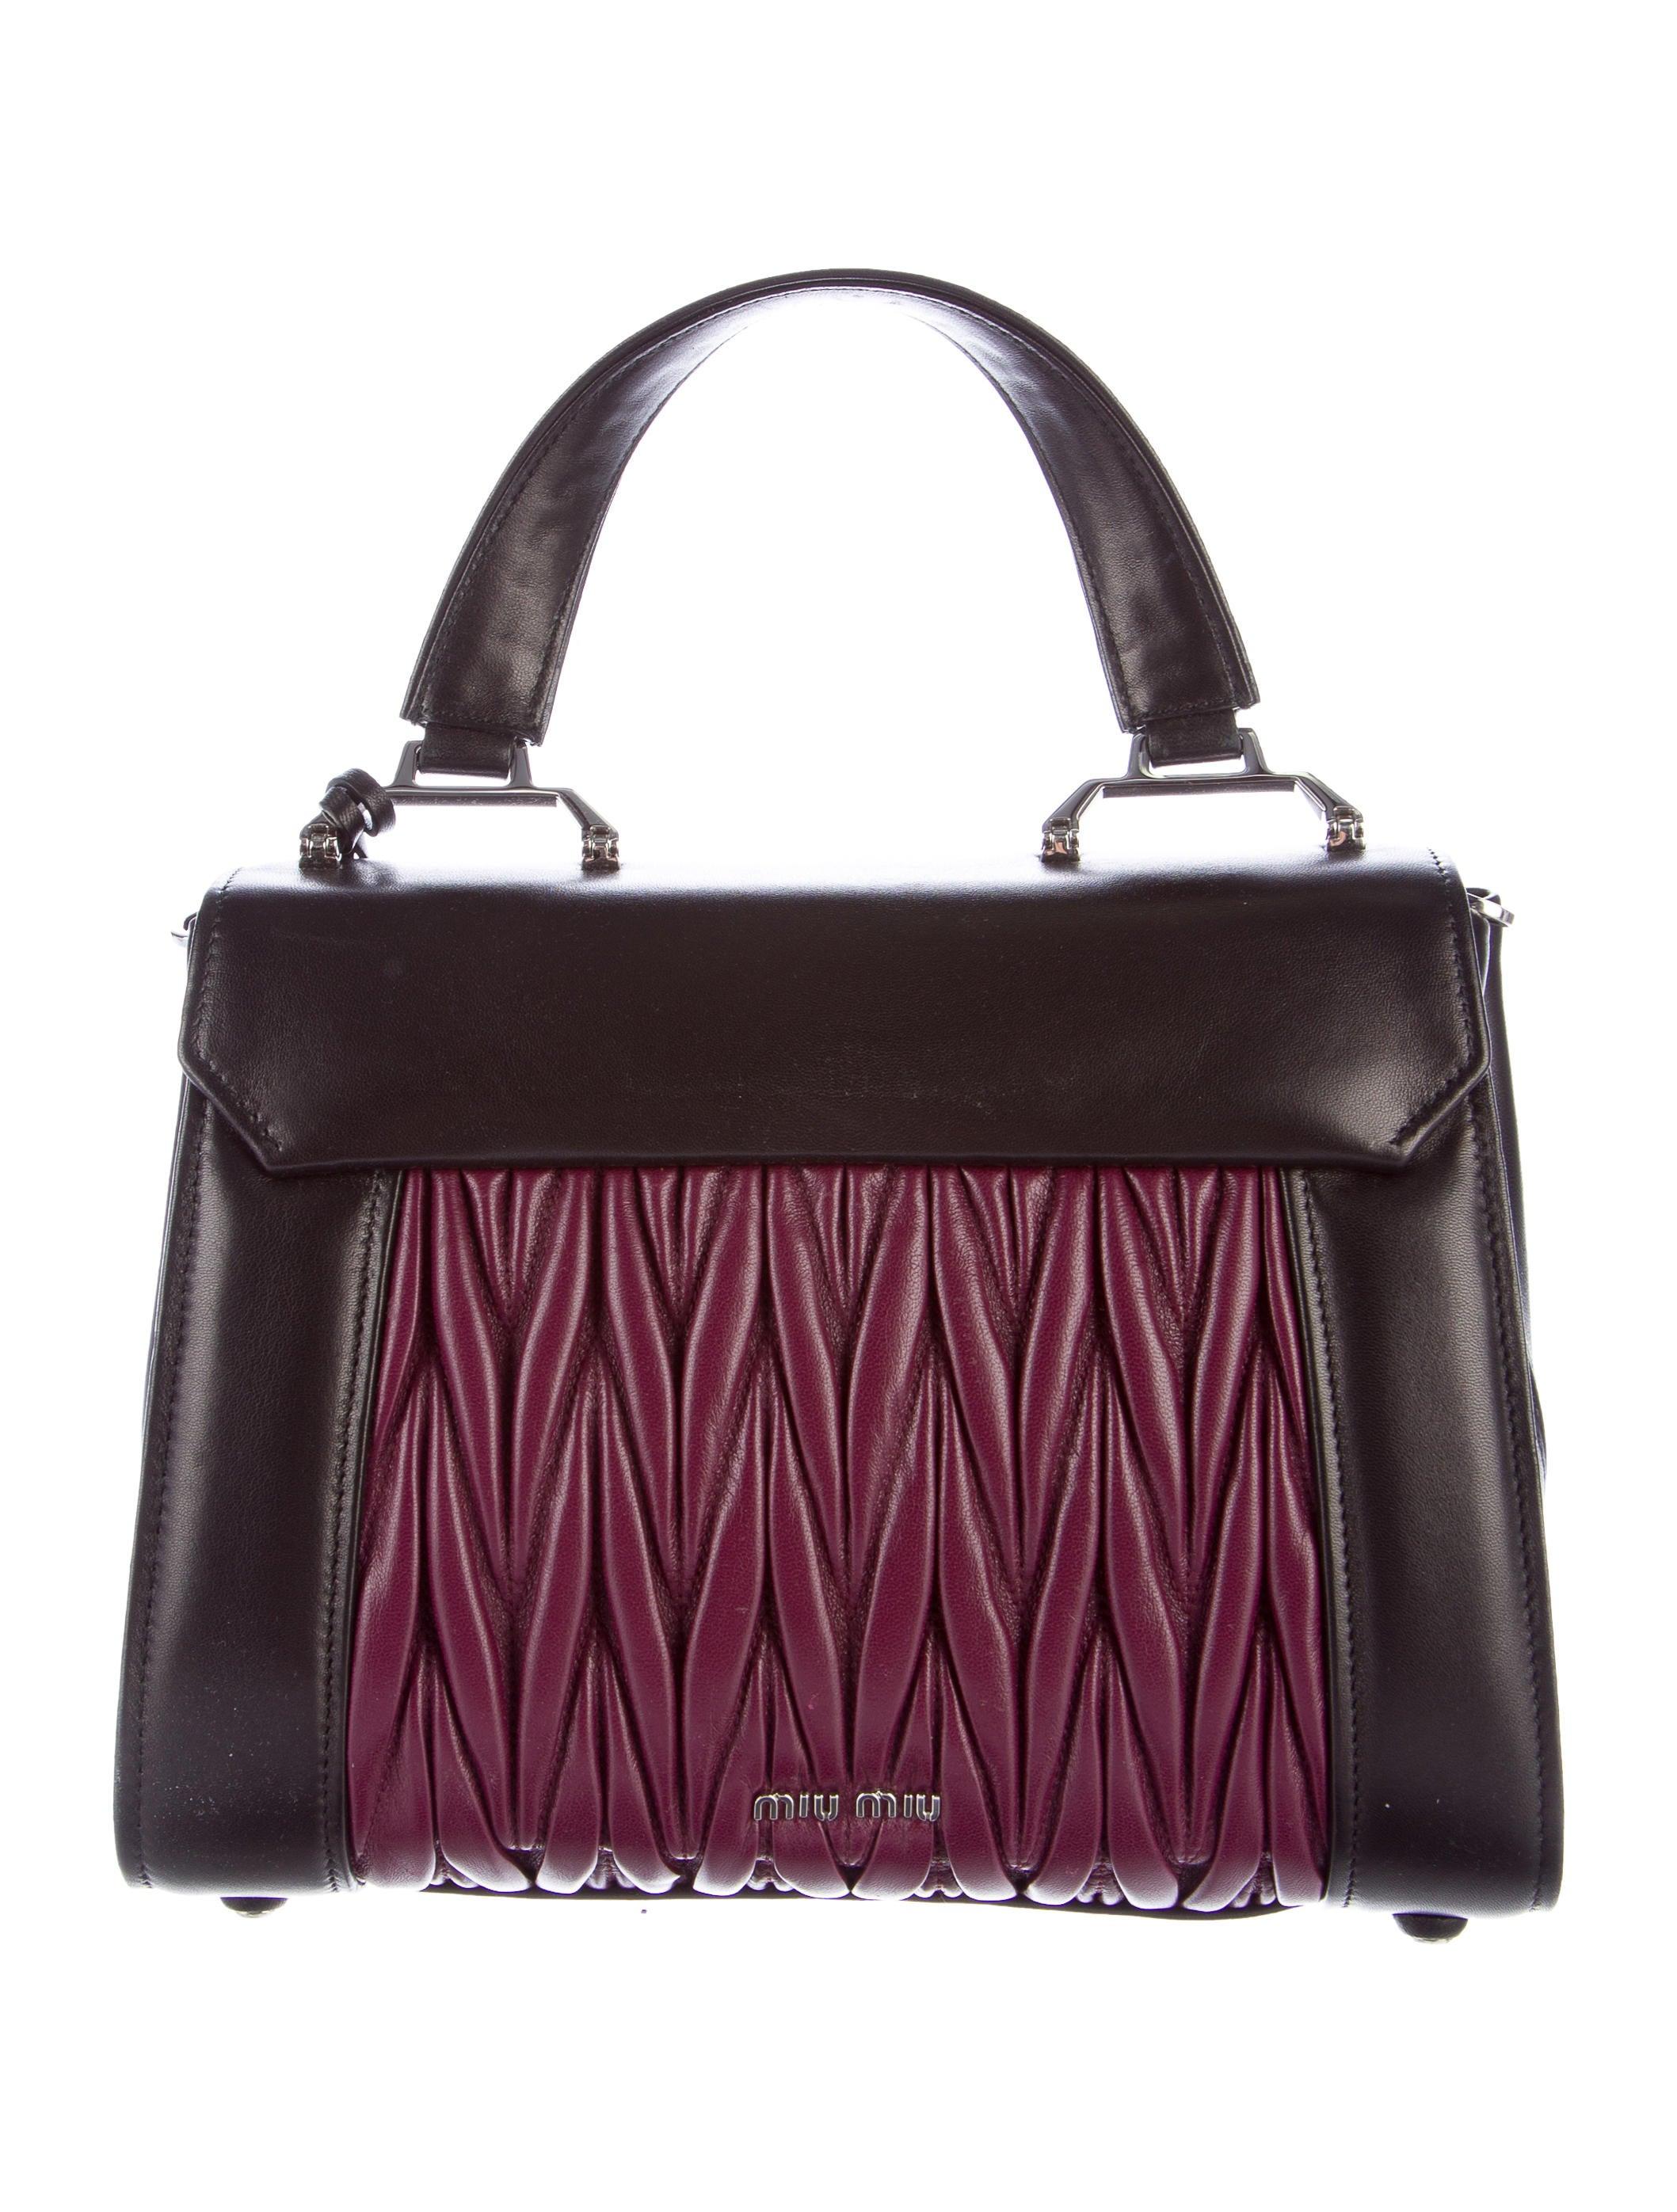 701c343b5e8e Miu Miu Soft Leather Matelasse Handbag - Handbags - MIU51242